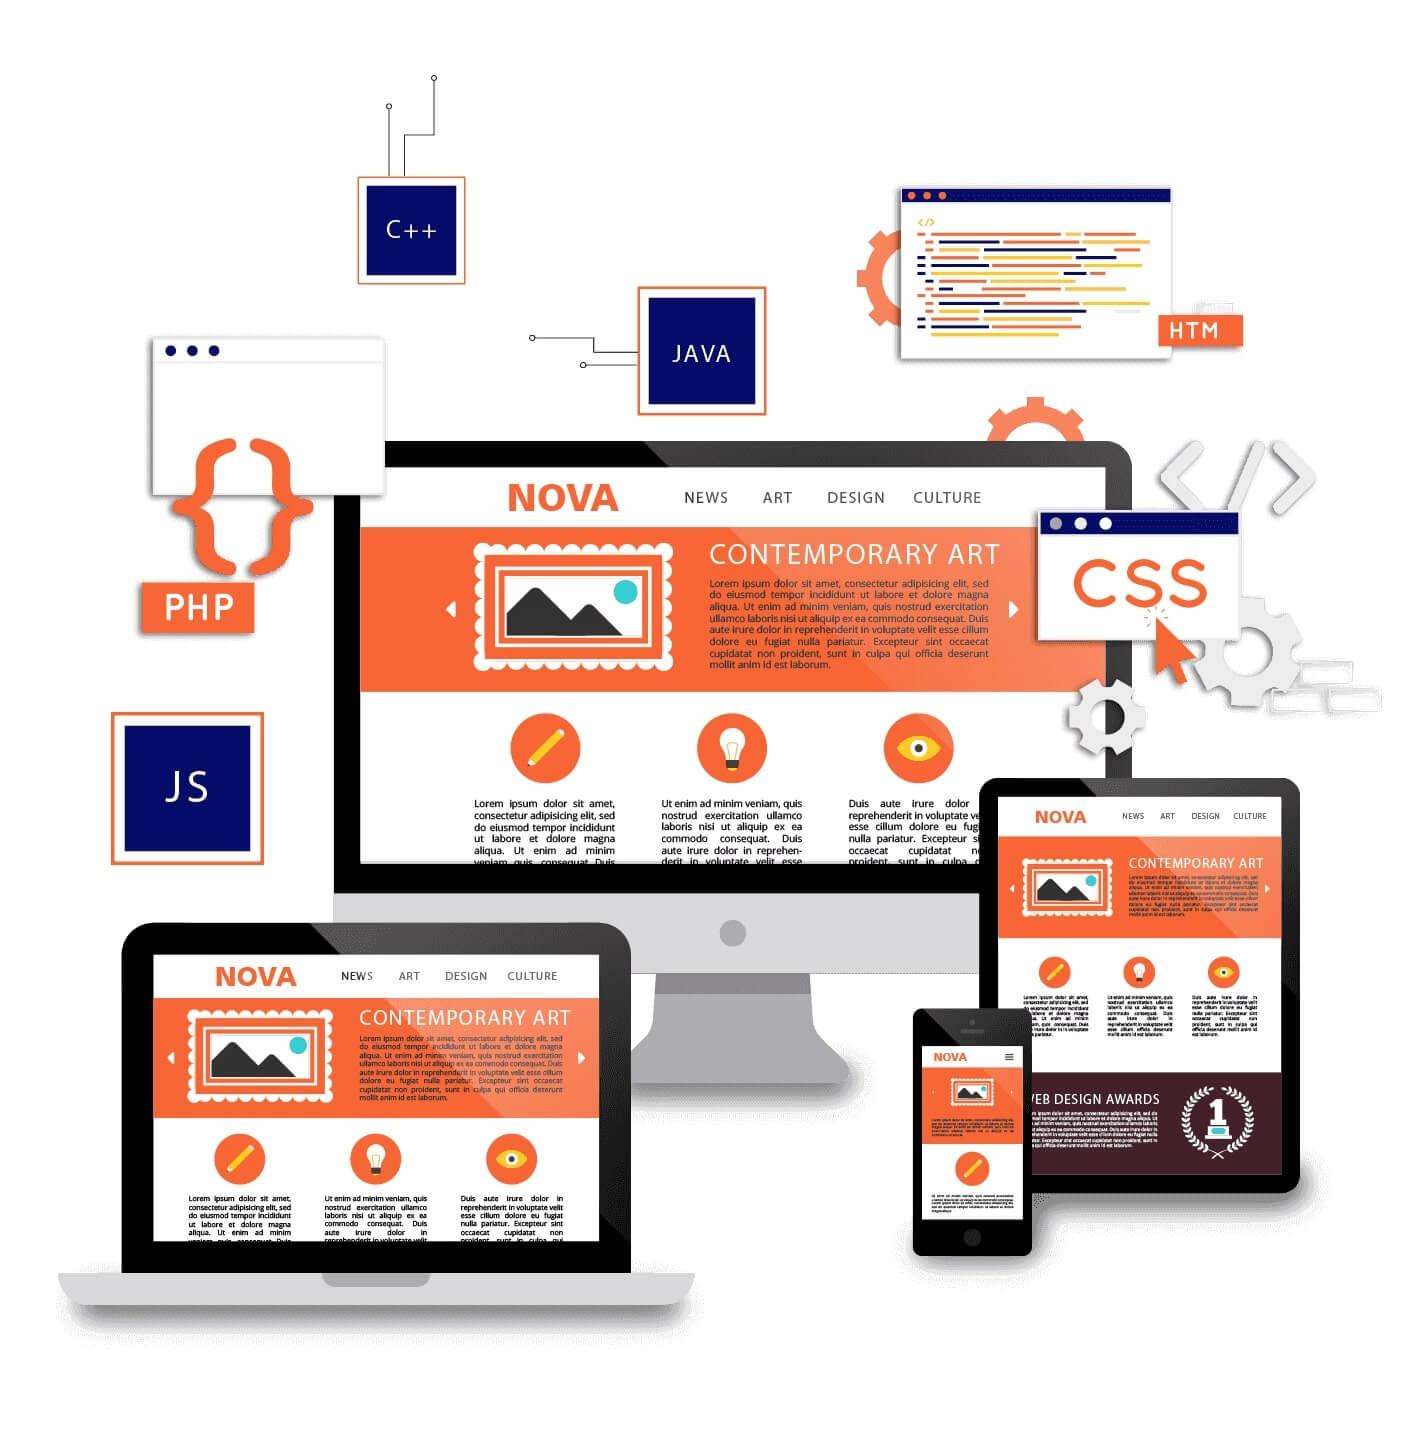 web-design-and-development-auckland